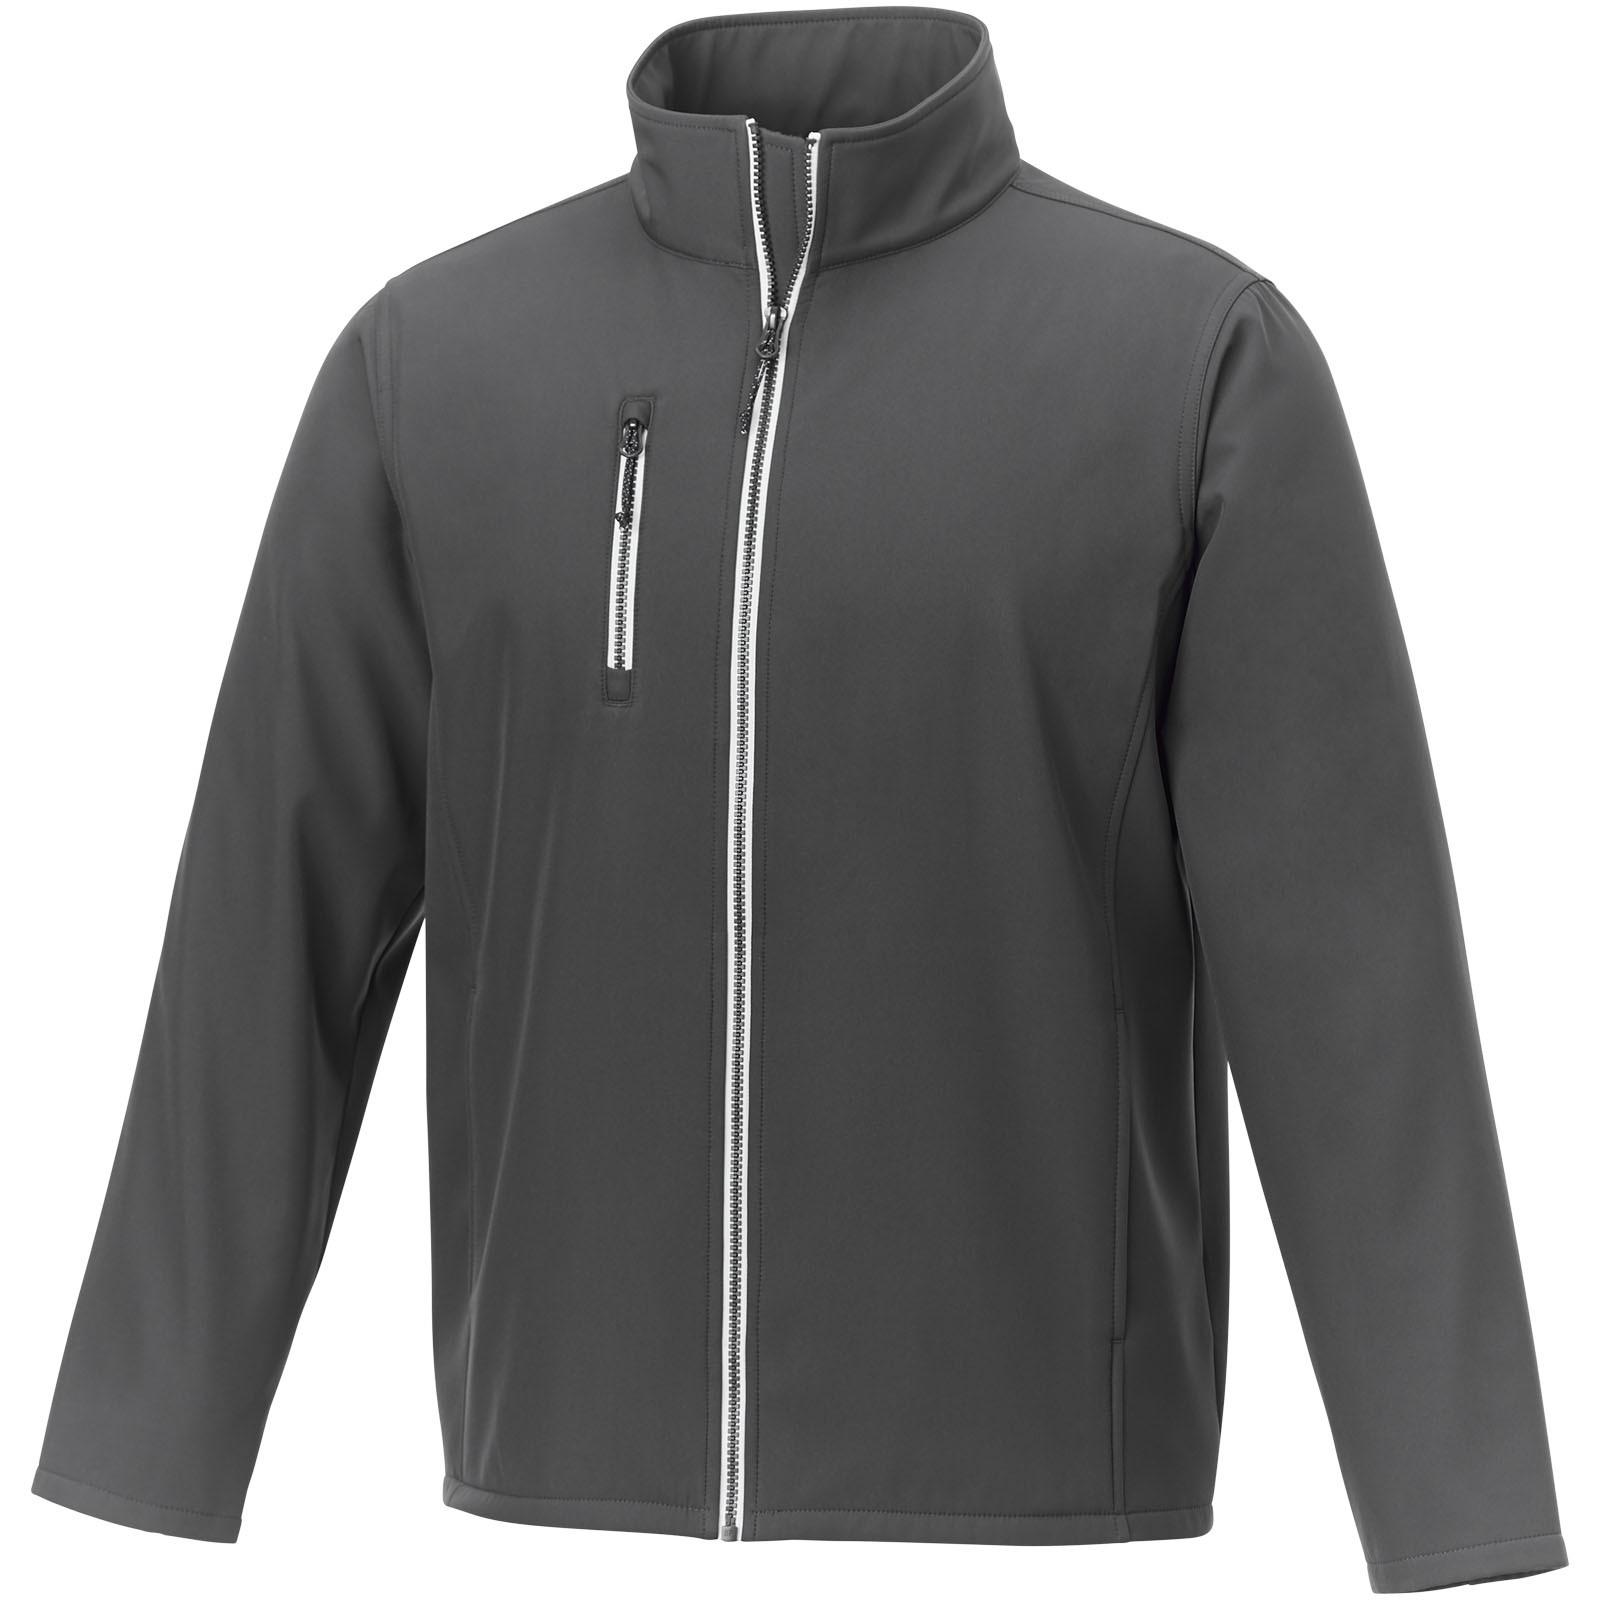 Orion men's softshell jacket - Storm Grey / XS